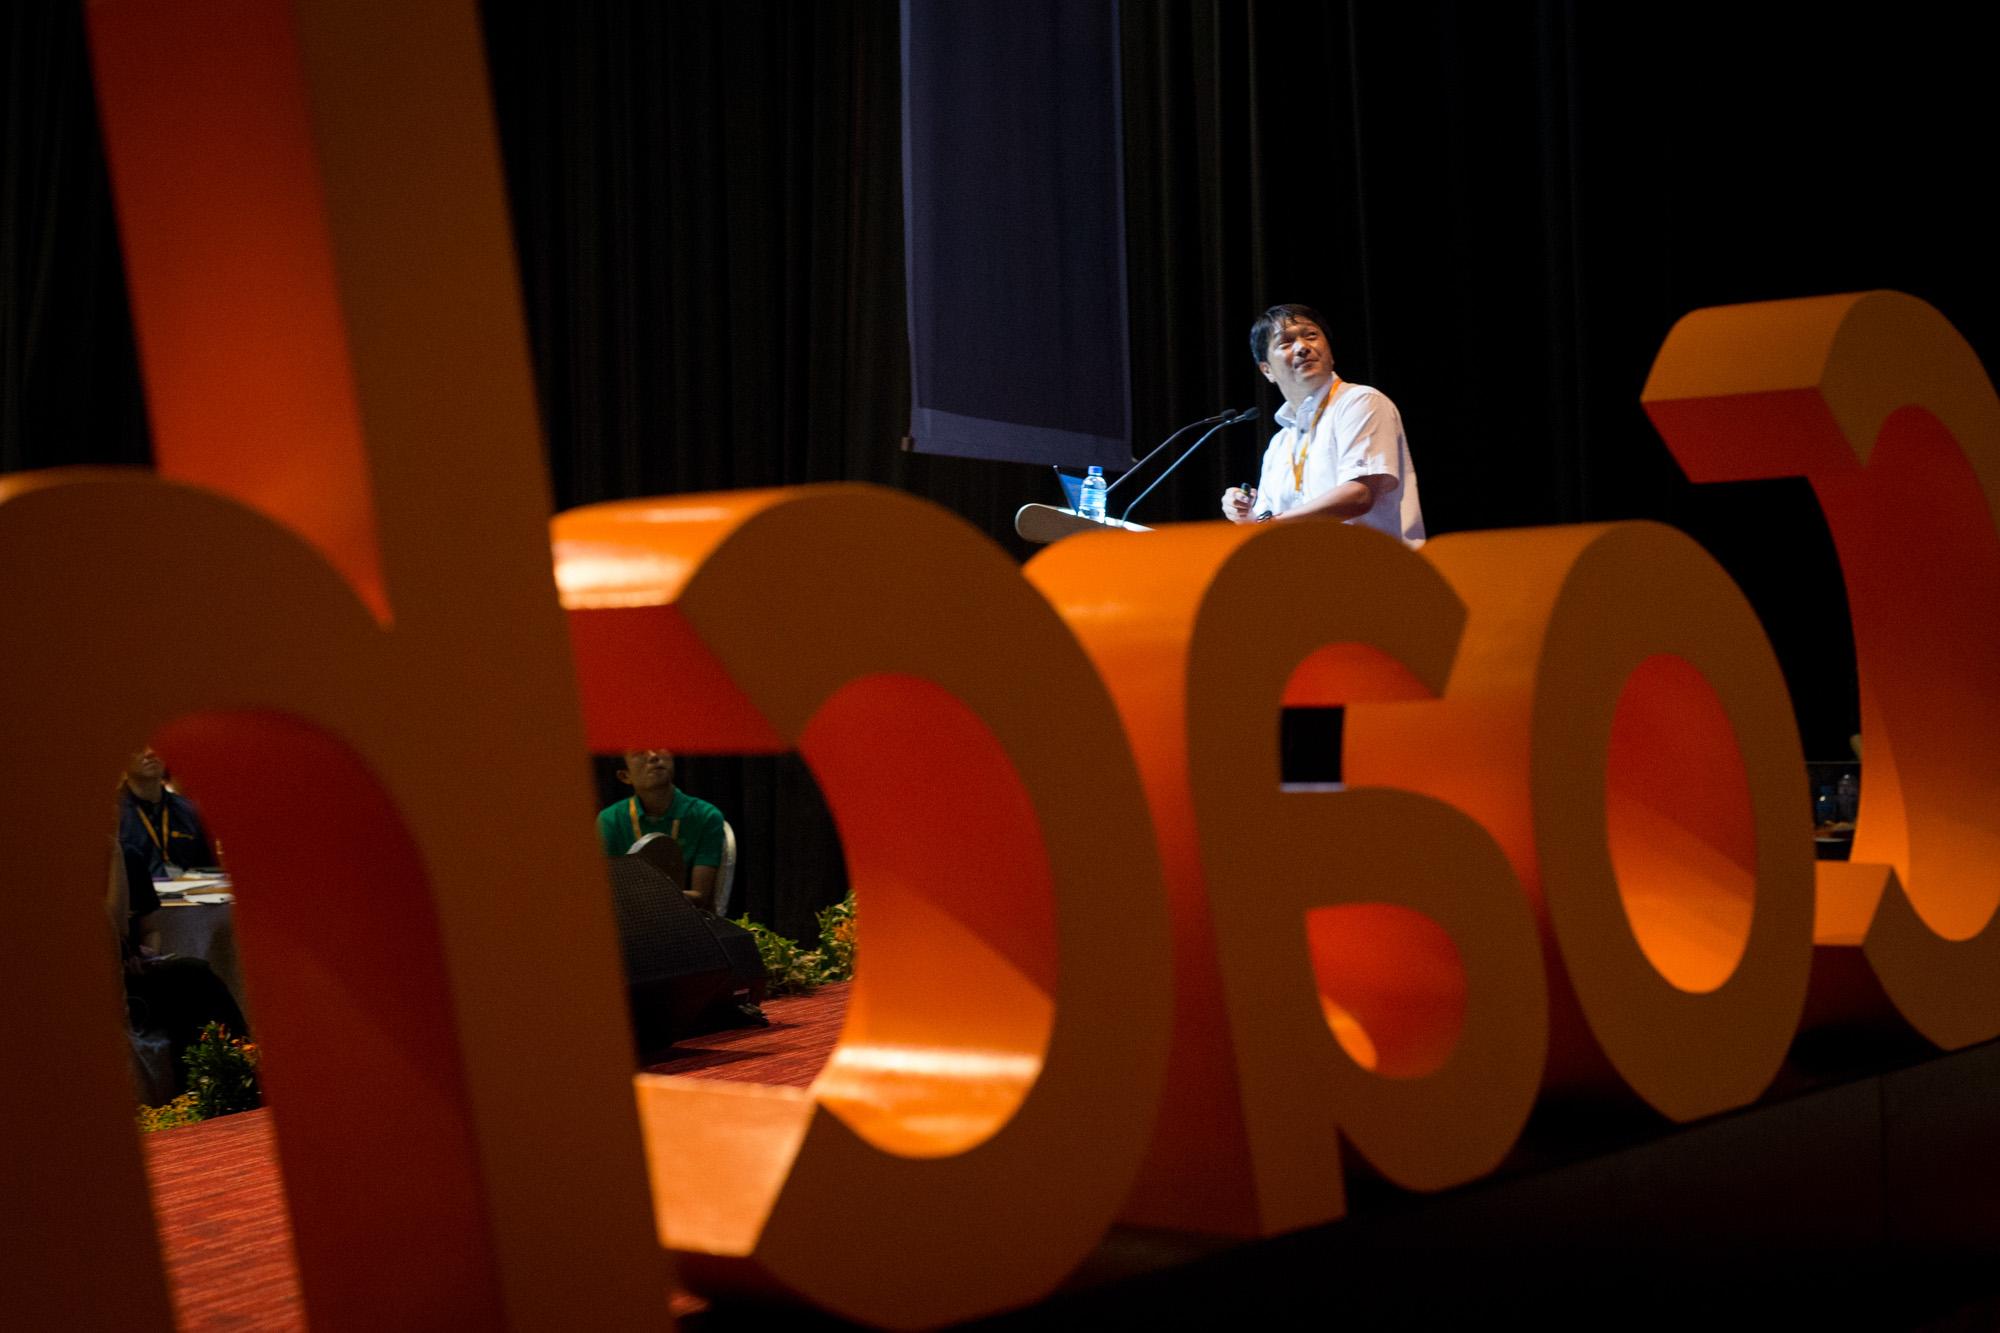 SportSG_CoachSG_Conference-18.jpg